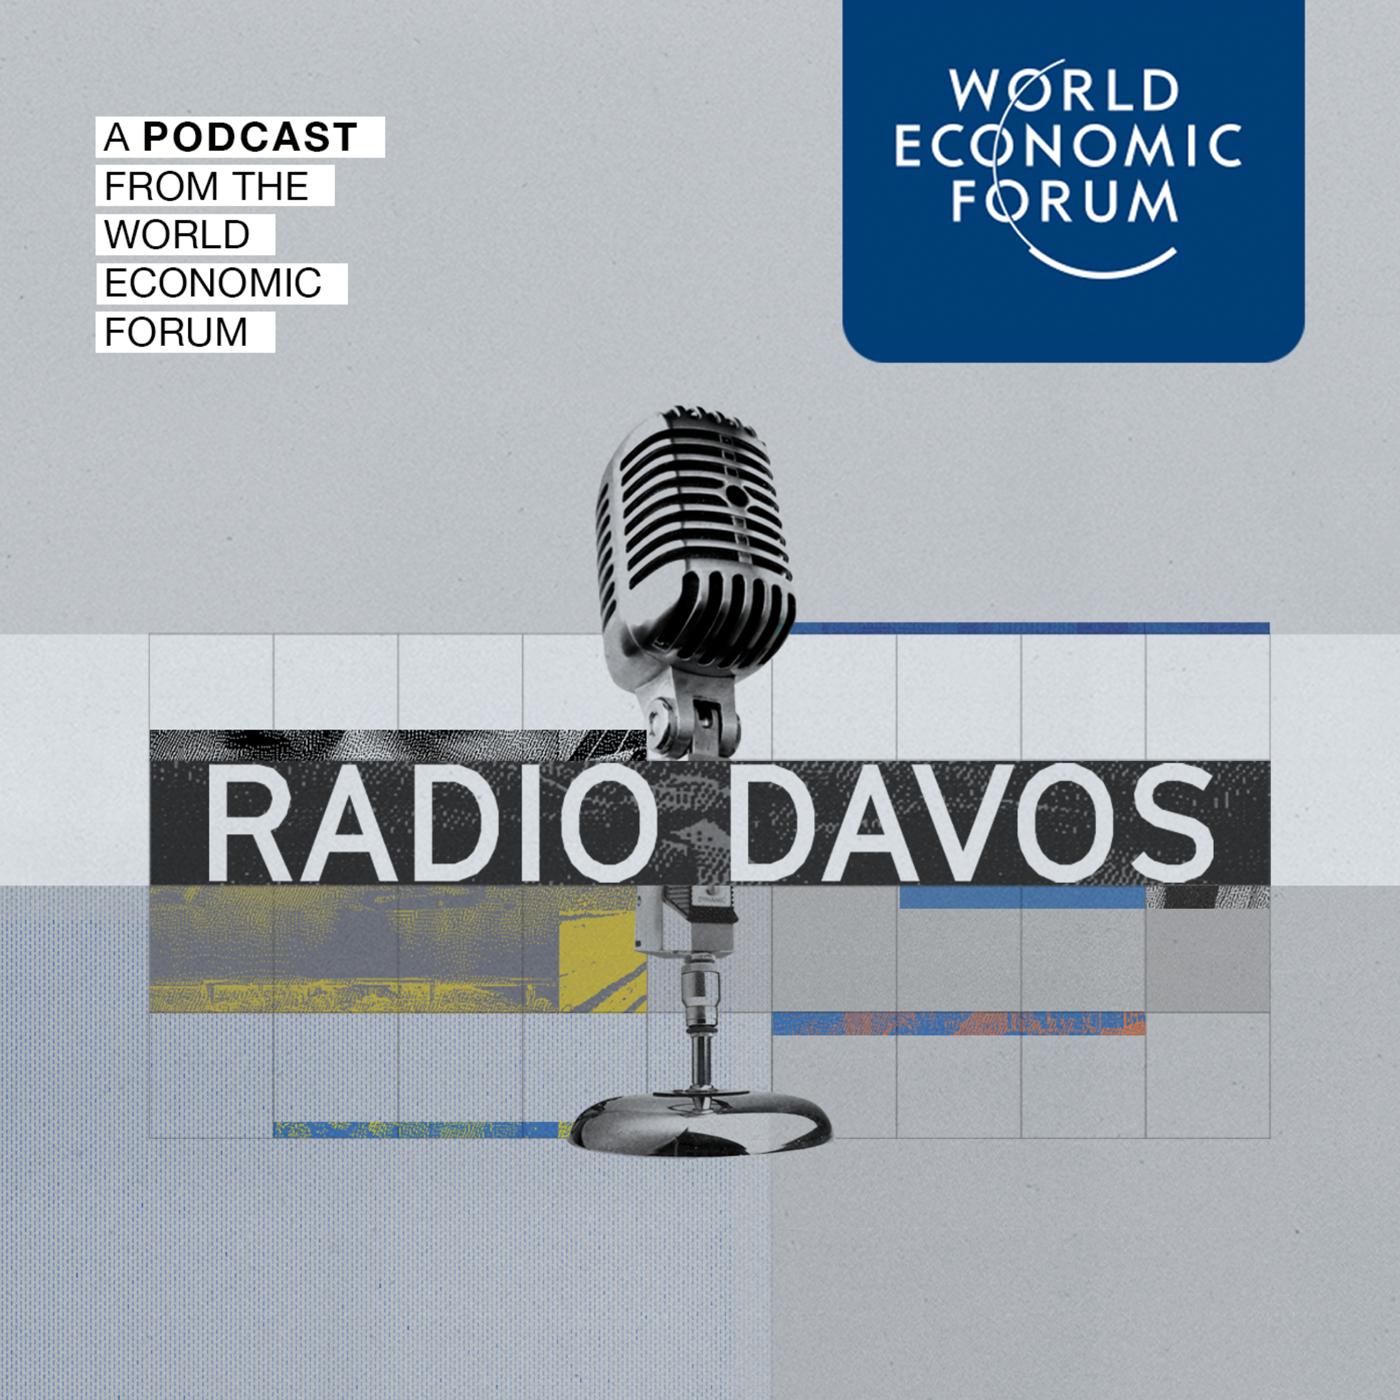 Global Technology Governance Summit